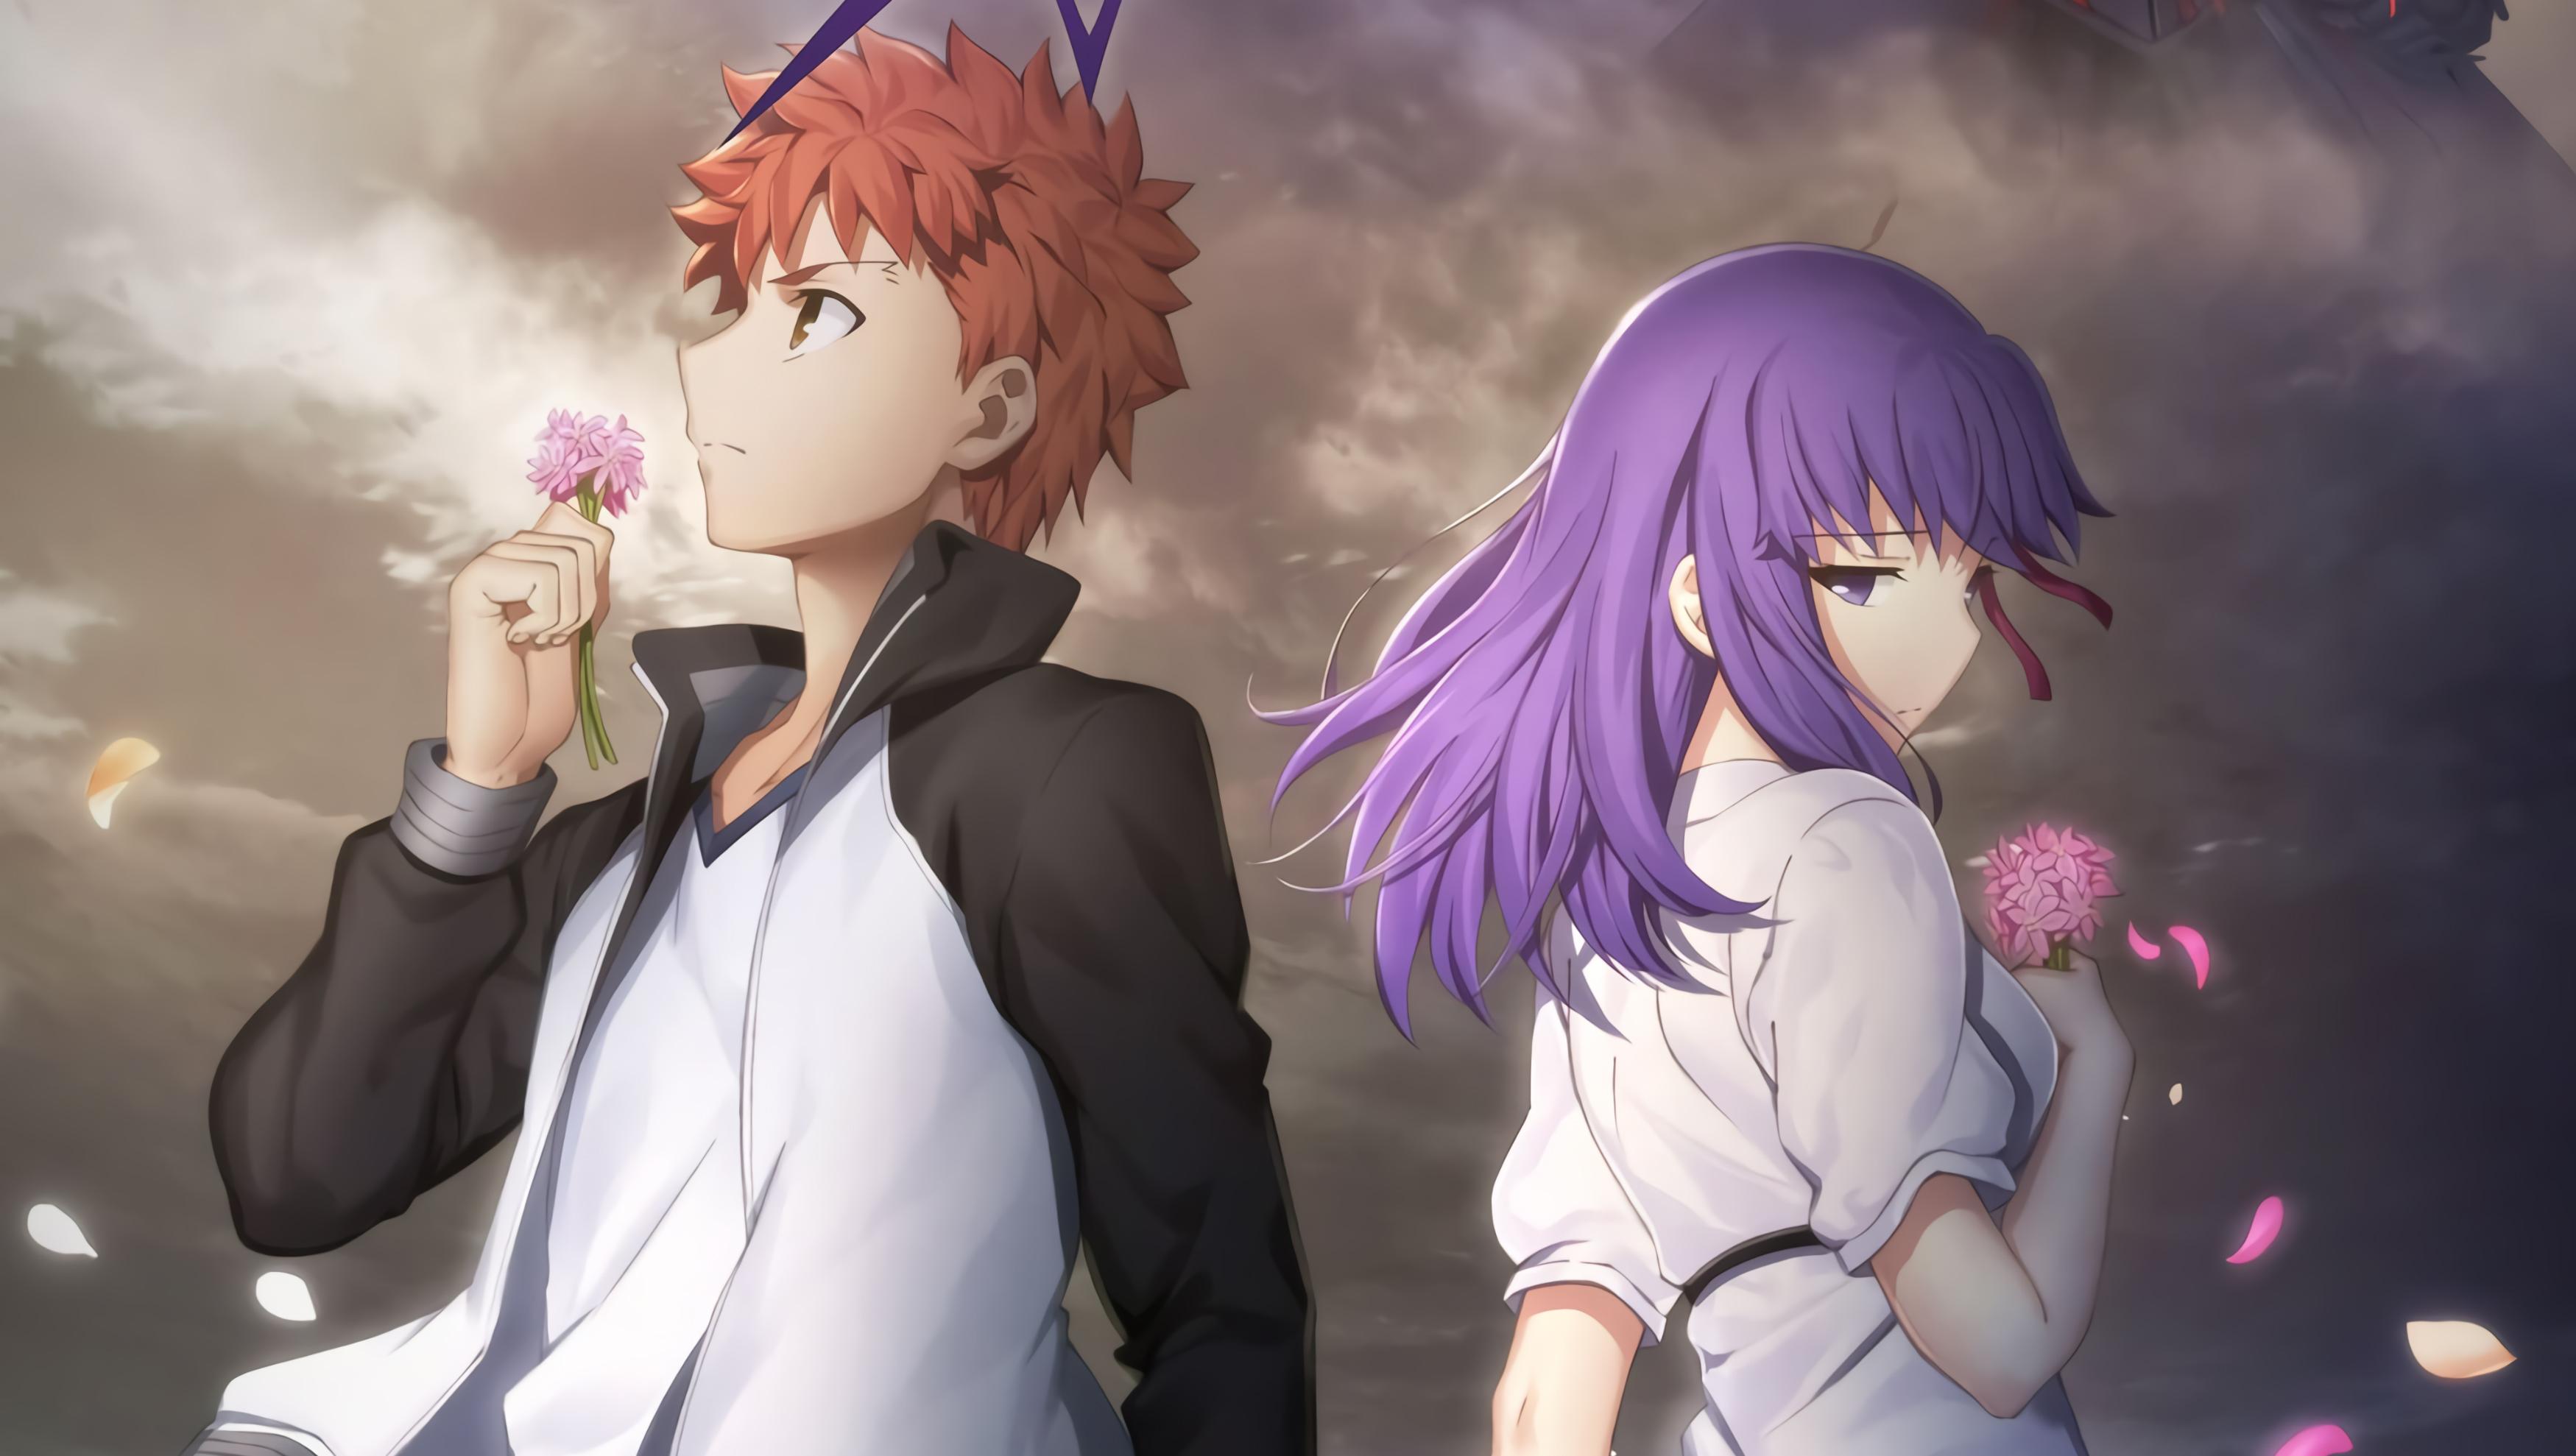 【BD1080P/剧场版】Fate/stay night [Heaven's Feel] Ⅱ:迷失之蝶【幻之精翻精校版/ED特效 】